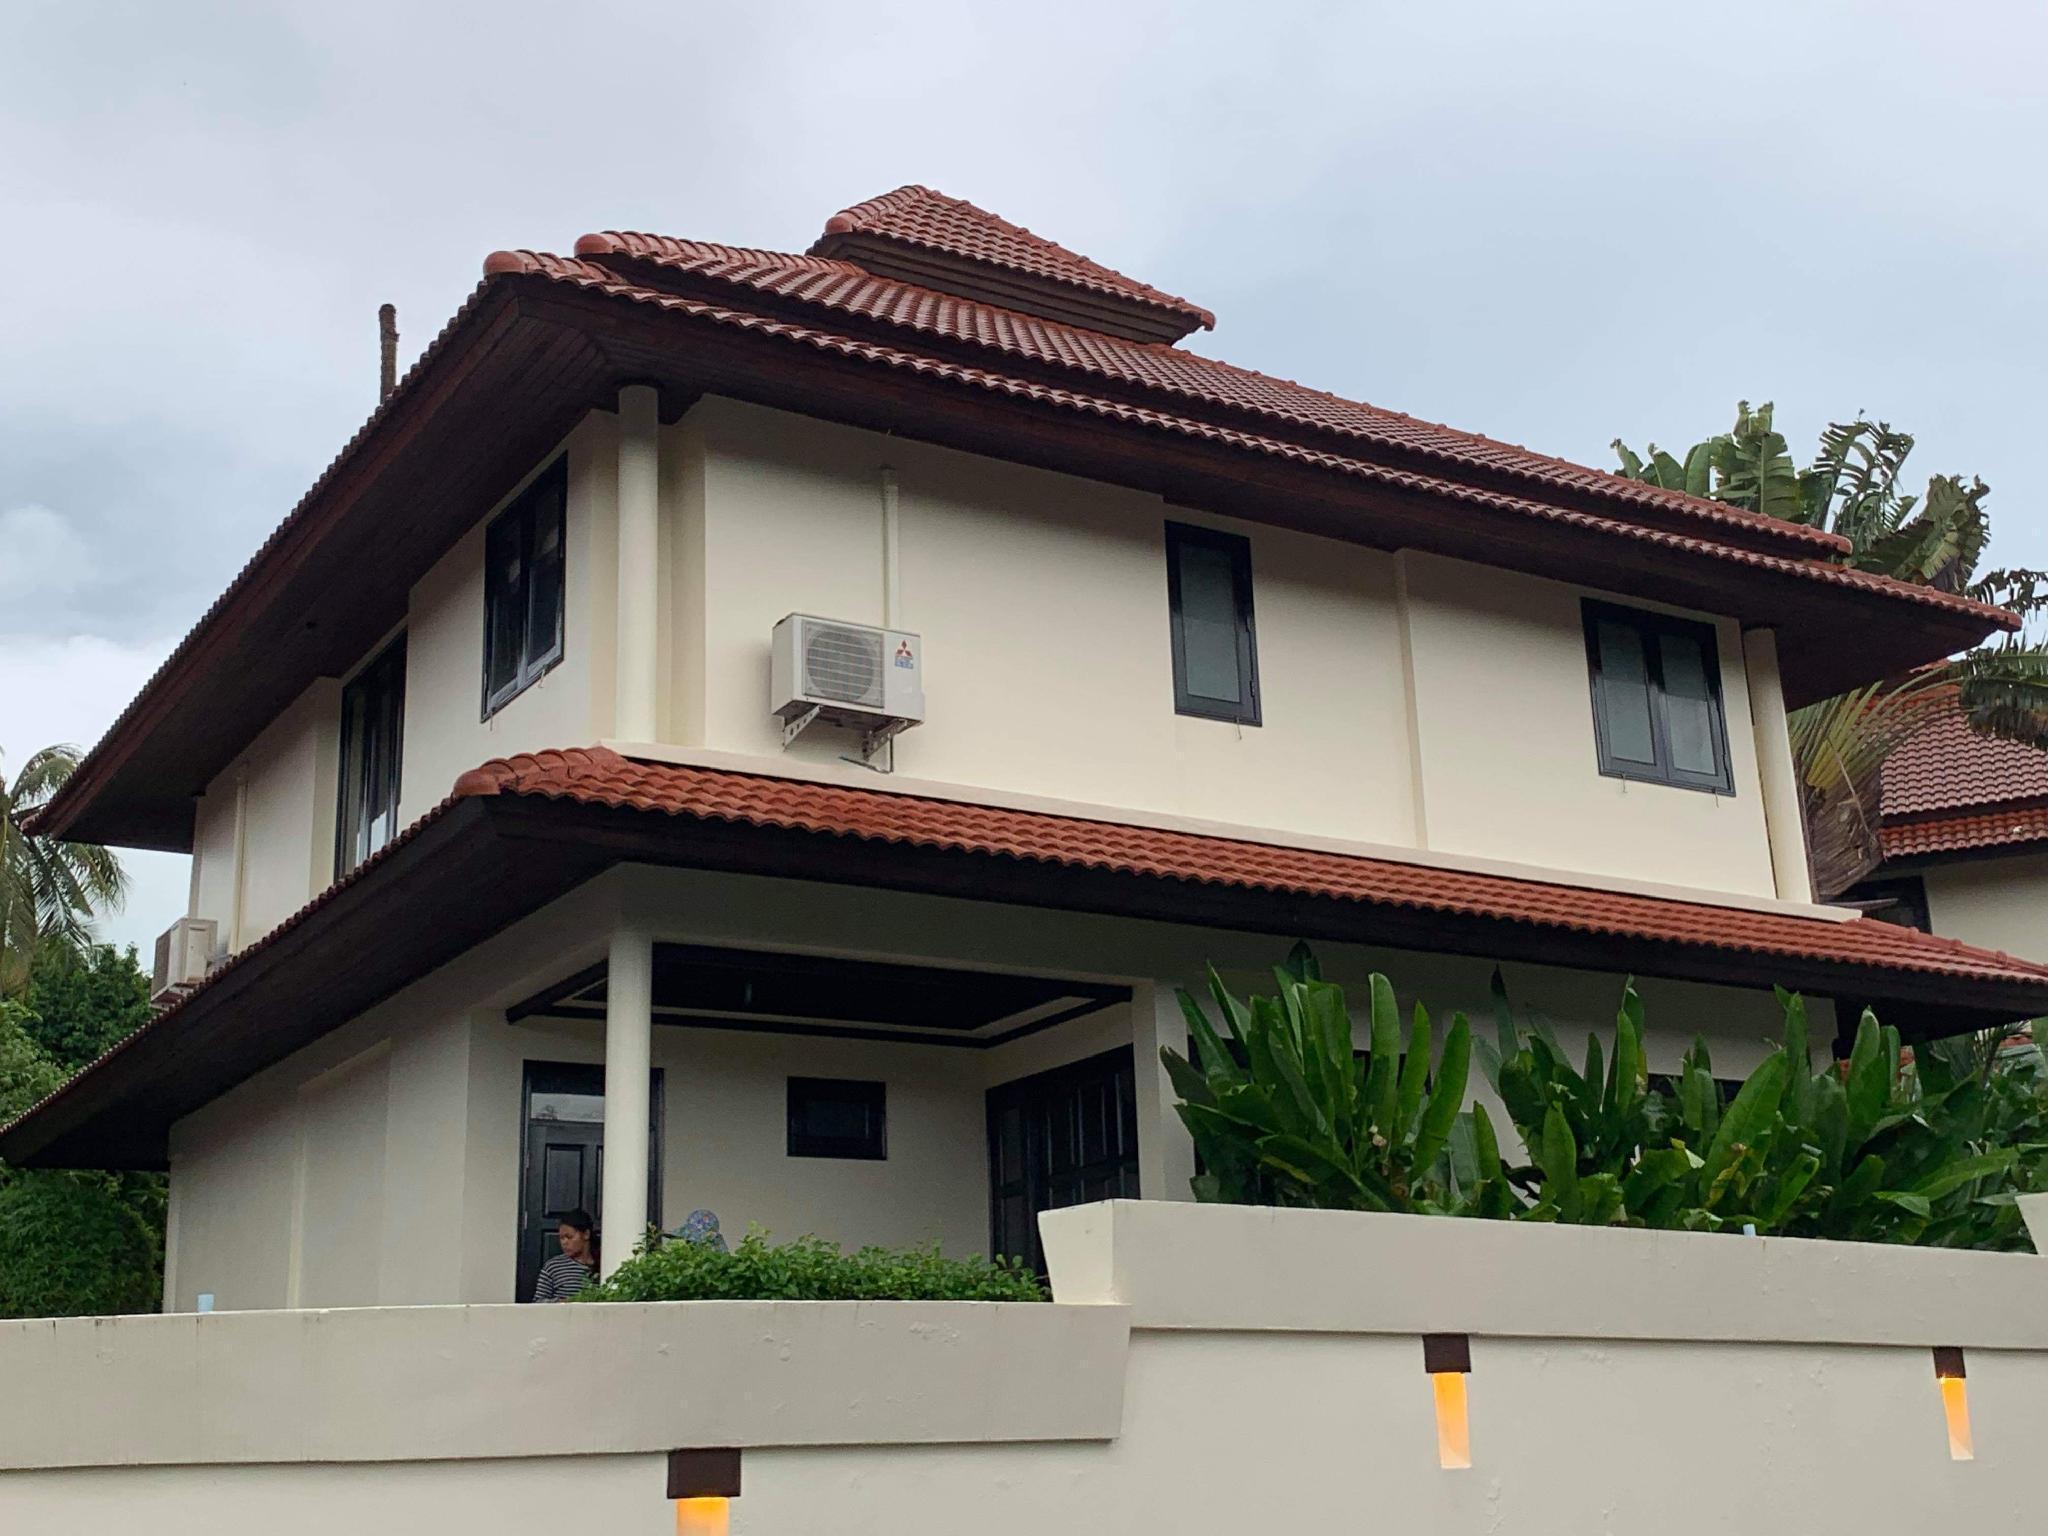 3 Bed Villa Beach Front Resort TG21 วิลลา 3 ห้องนอน 2 ห้องน้ำส่วนตัว ขนาด 300 ตร.ม. – เชิงมน